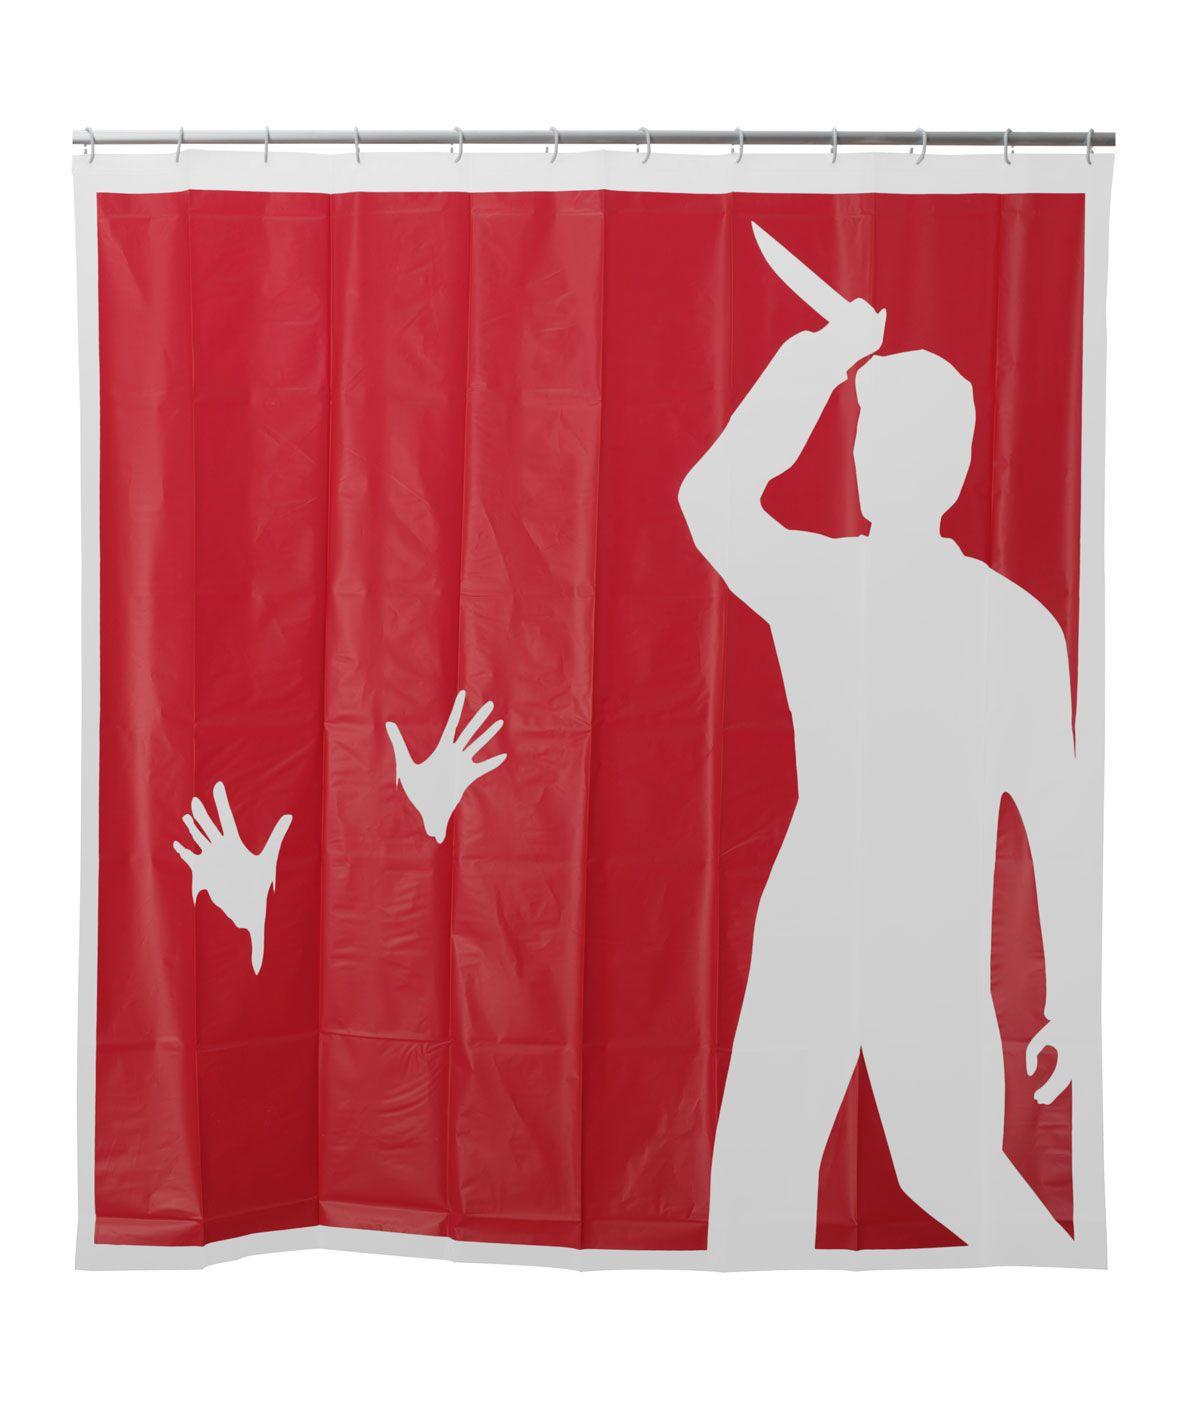 Psycho Shower Curtain Psycho Shower Scene Stabbing Curtain